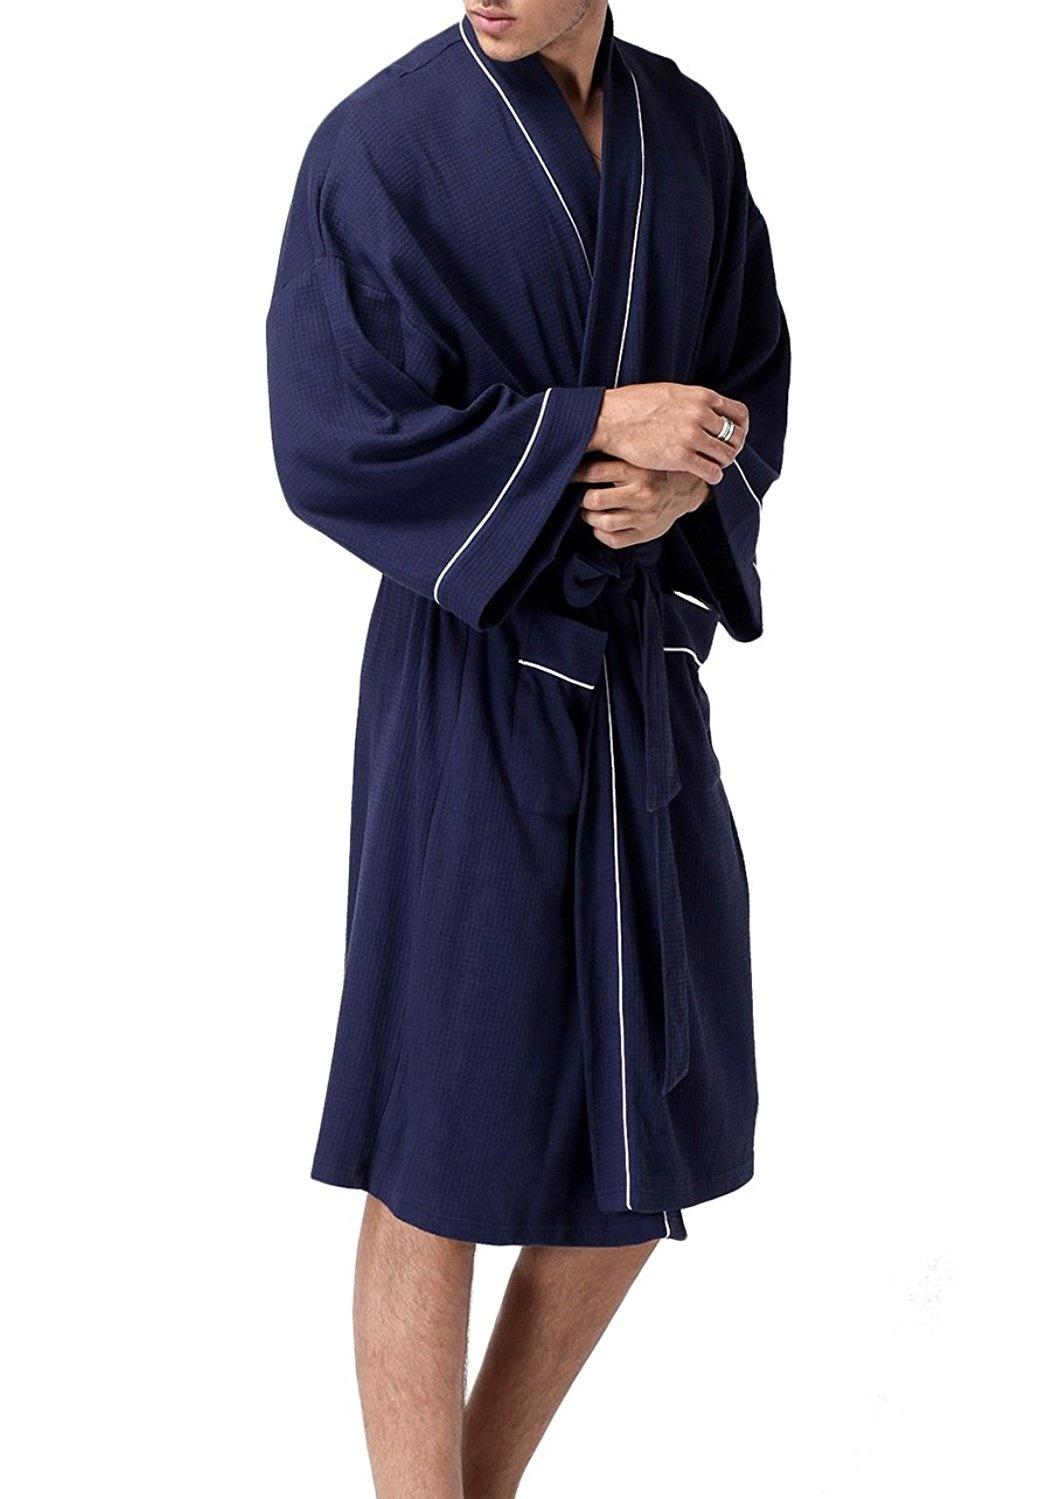 6d41a1fa43 MJEWELRYGIFT - Women Men Hotel Spa Waffle Kimono Soft Warm Long Hooded Robes  Sleepwear Bathrobe - Walmart.com